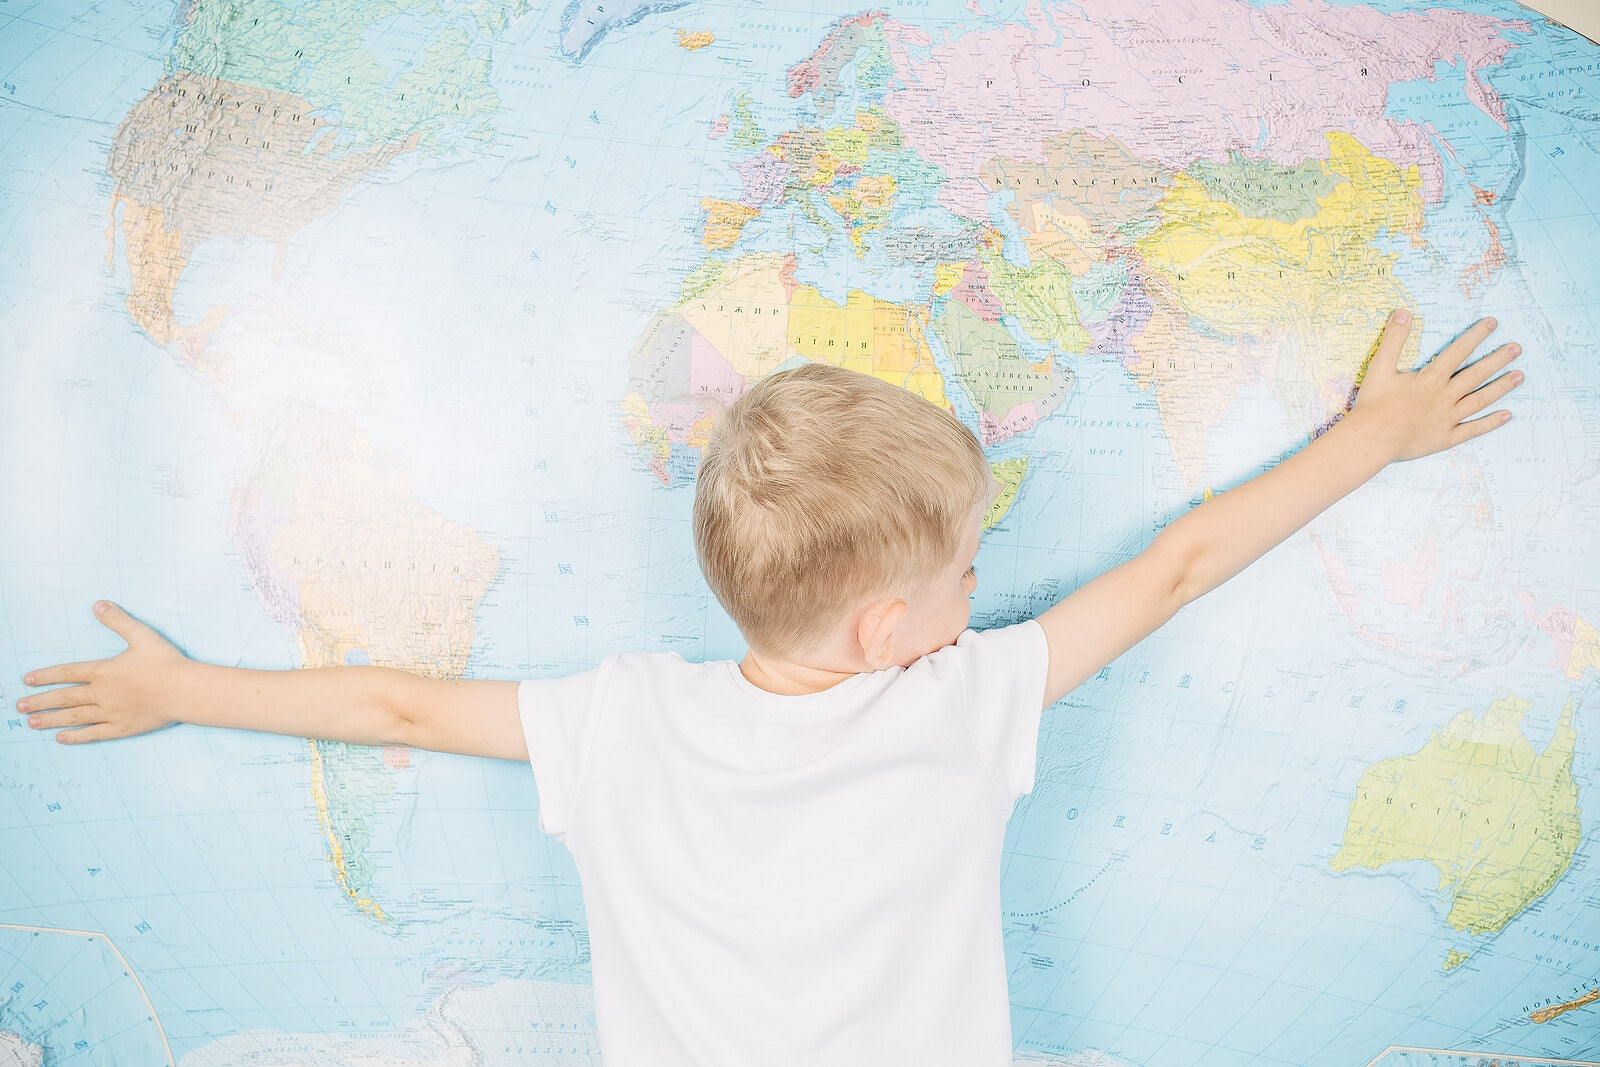 Niño abrazando un mapamundi infantil.